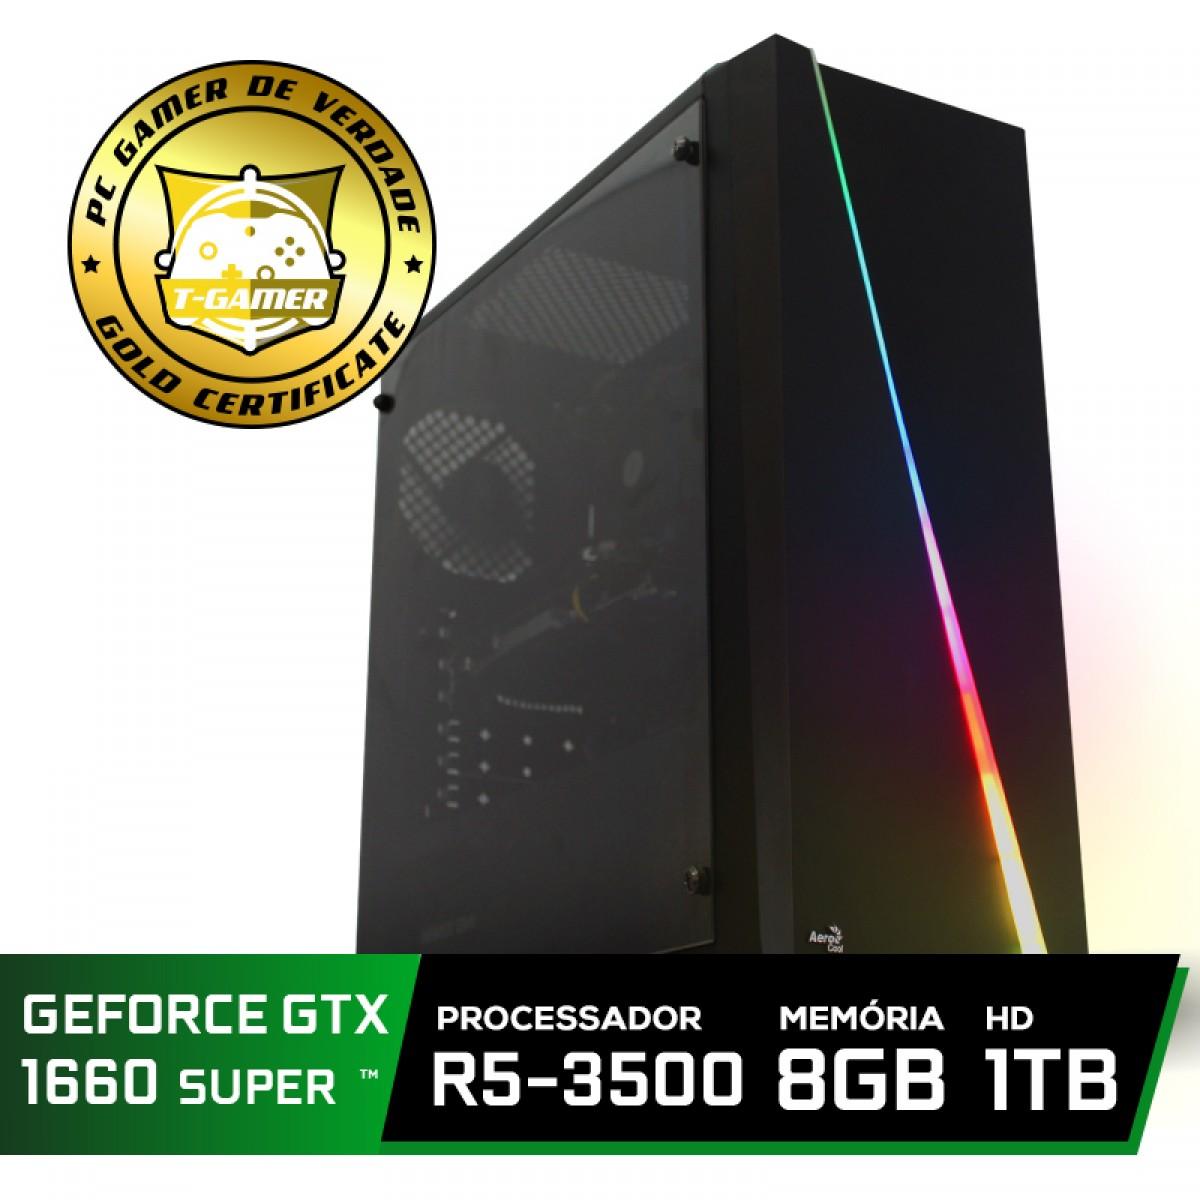 Pc Gamer T-Chaos Lvl-3 AMD Ryzen 5 3500 / GeForce GTX 1660 Super 6GB / DDR4 8GB / HD 1TB / 500W